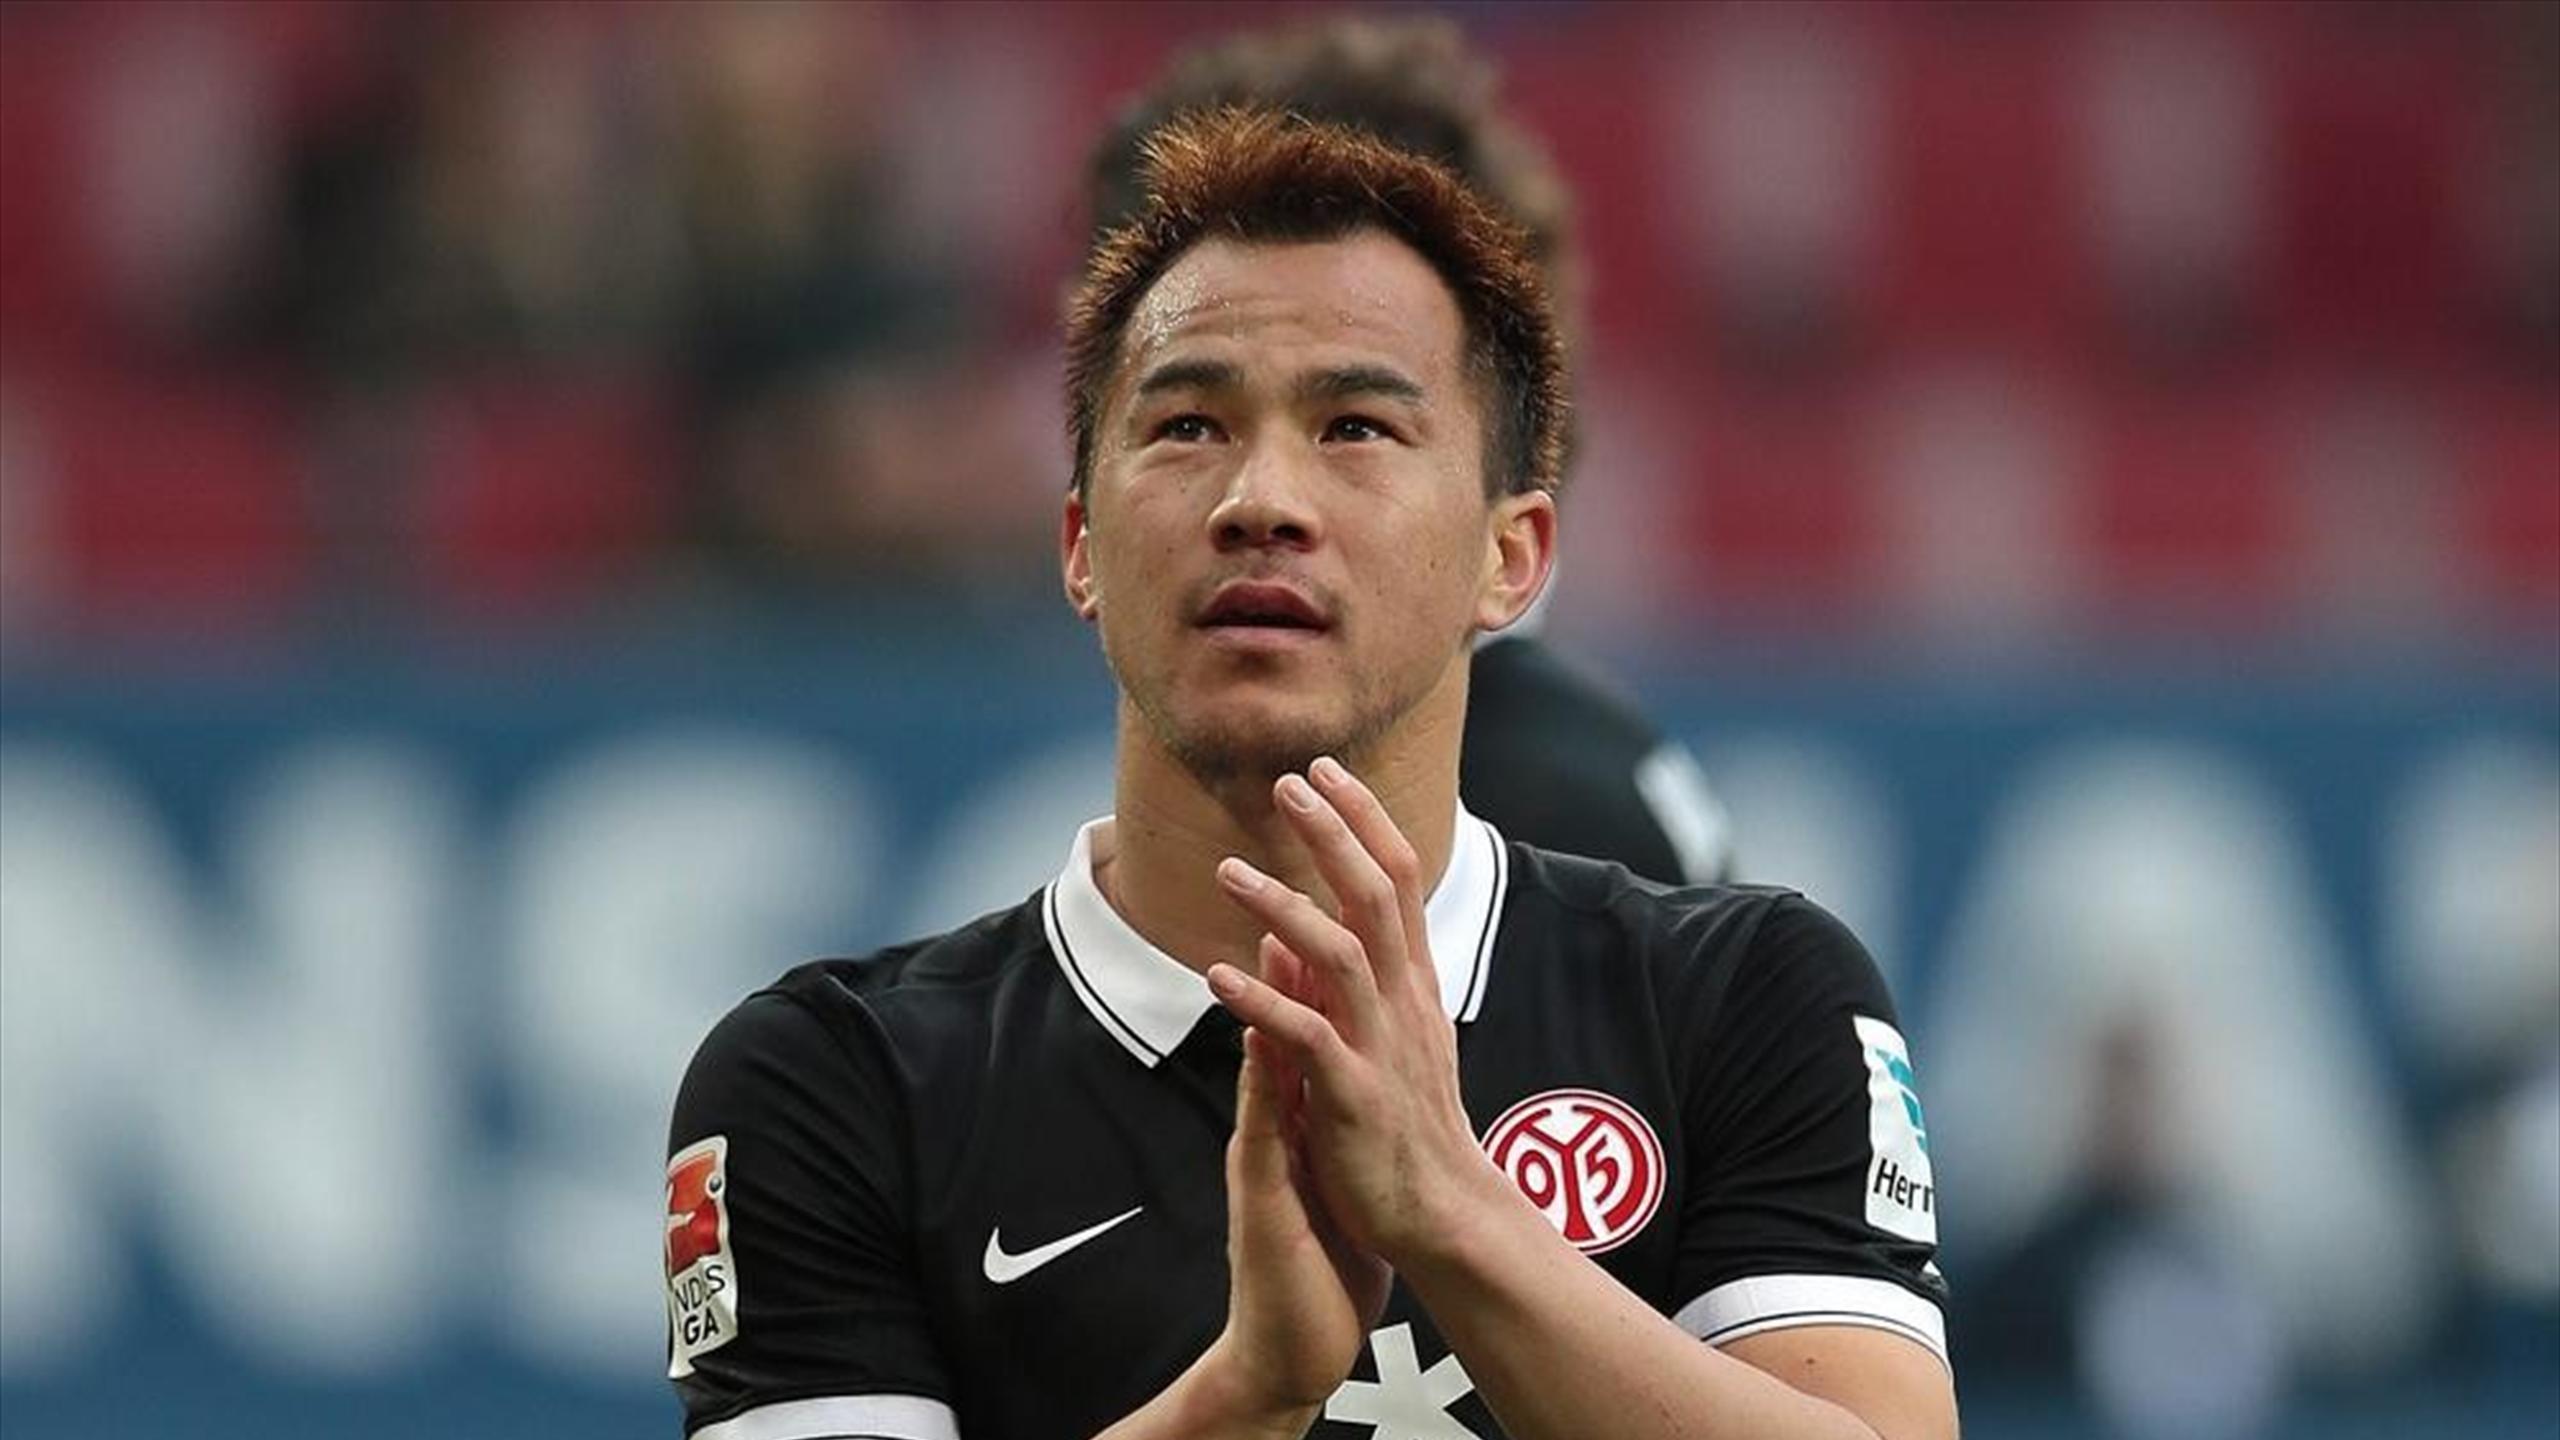 Shinji Okazaki set for Leicester City move